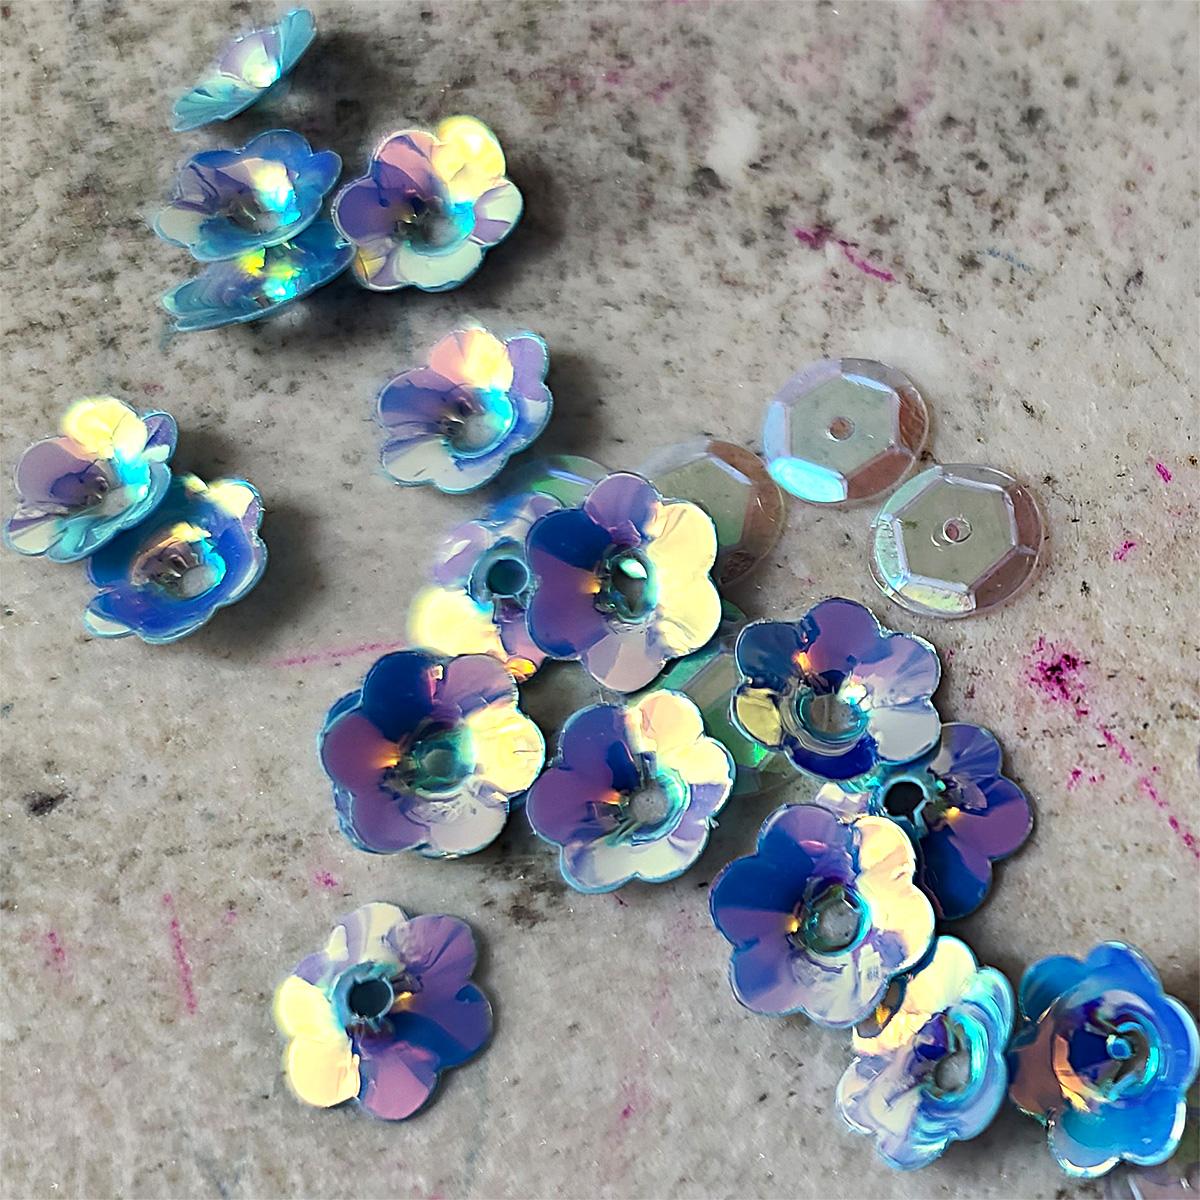 A pile of light blue iridescent flower shaped sequins.